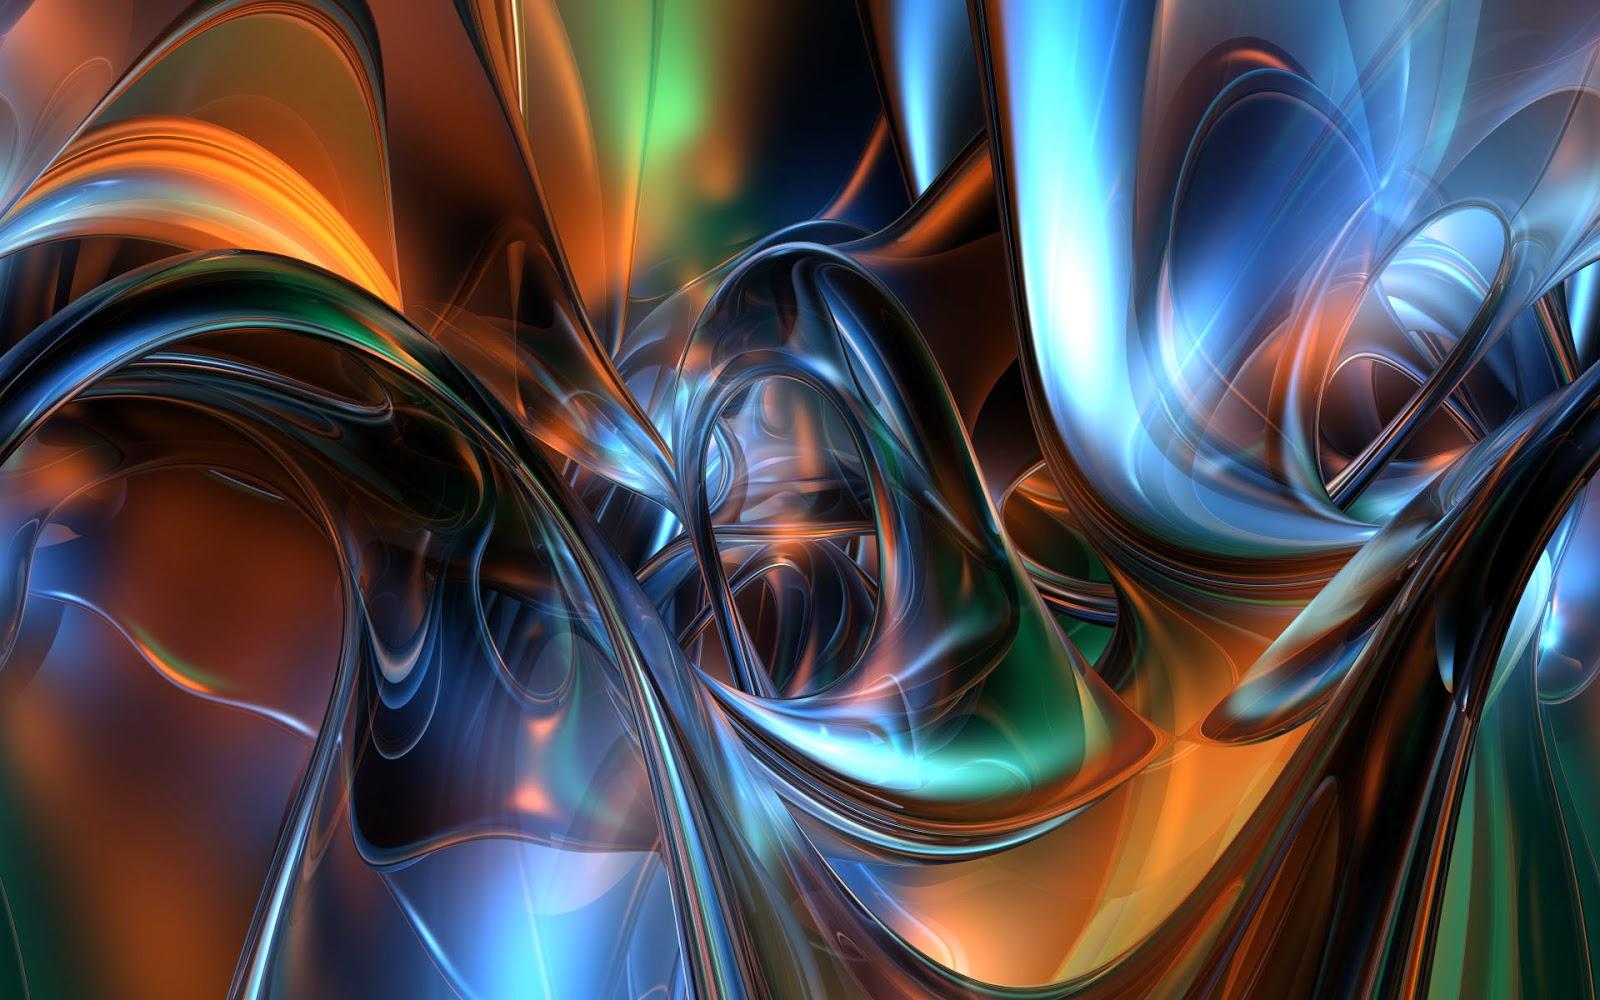 Beautiful 3d Art In Mix Colour Wallpaper Wallpapersxplore